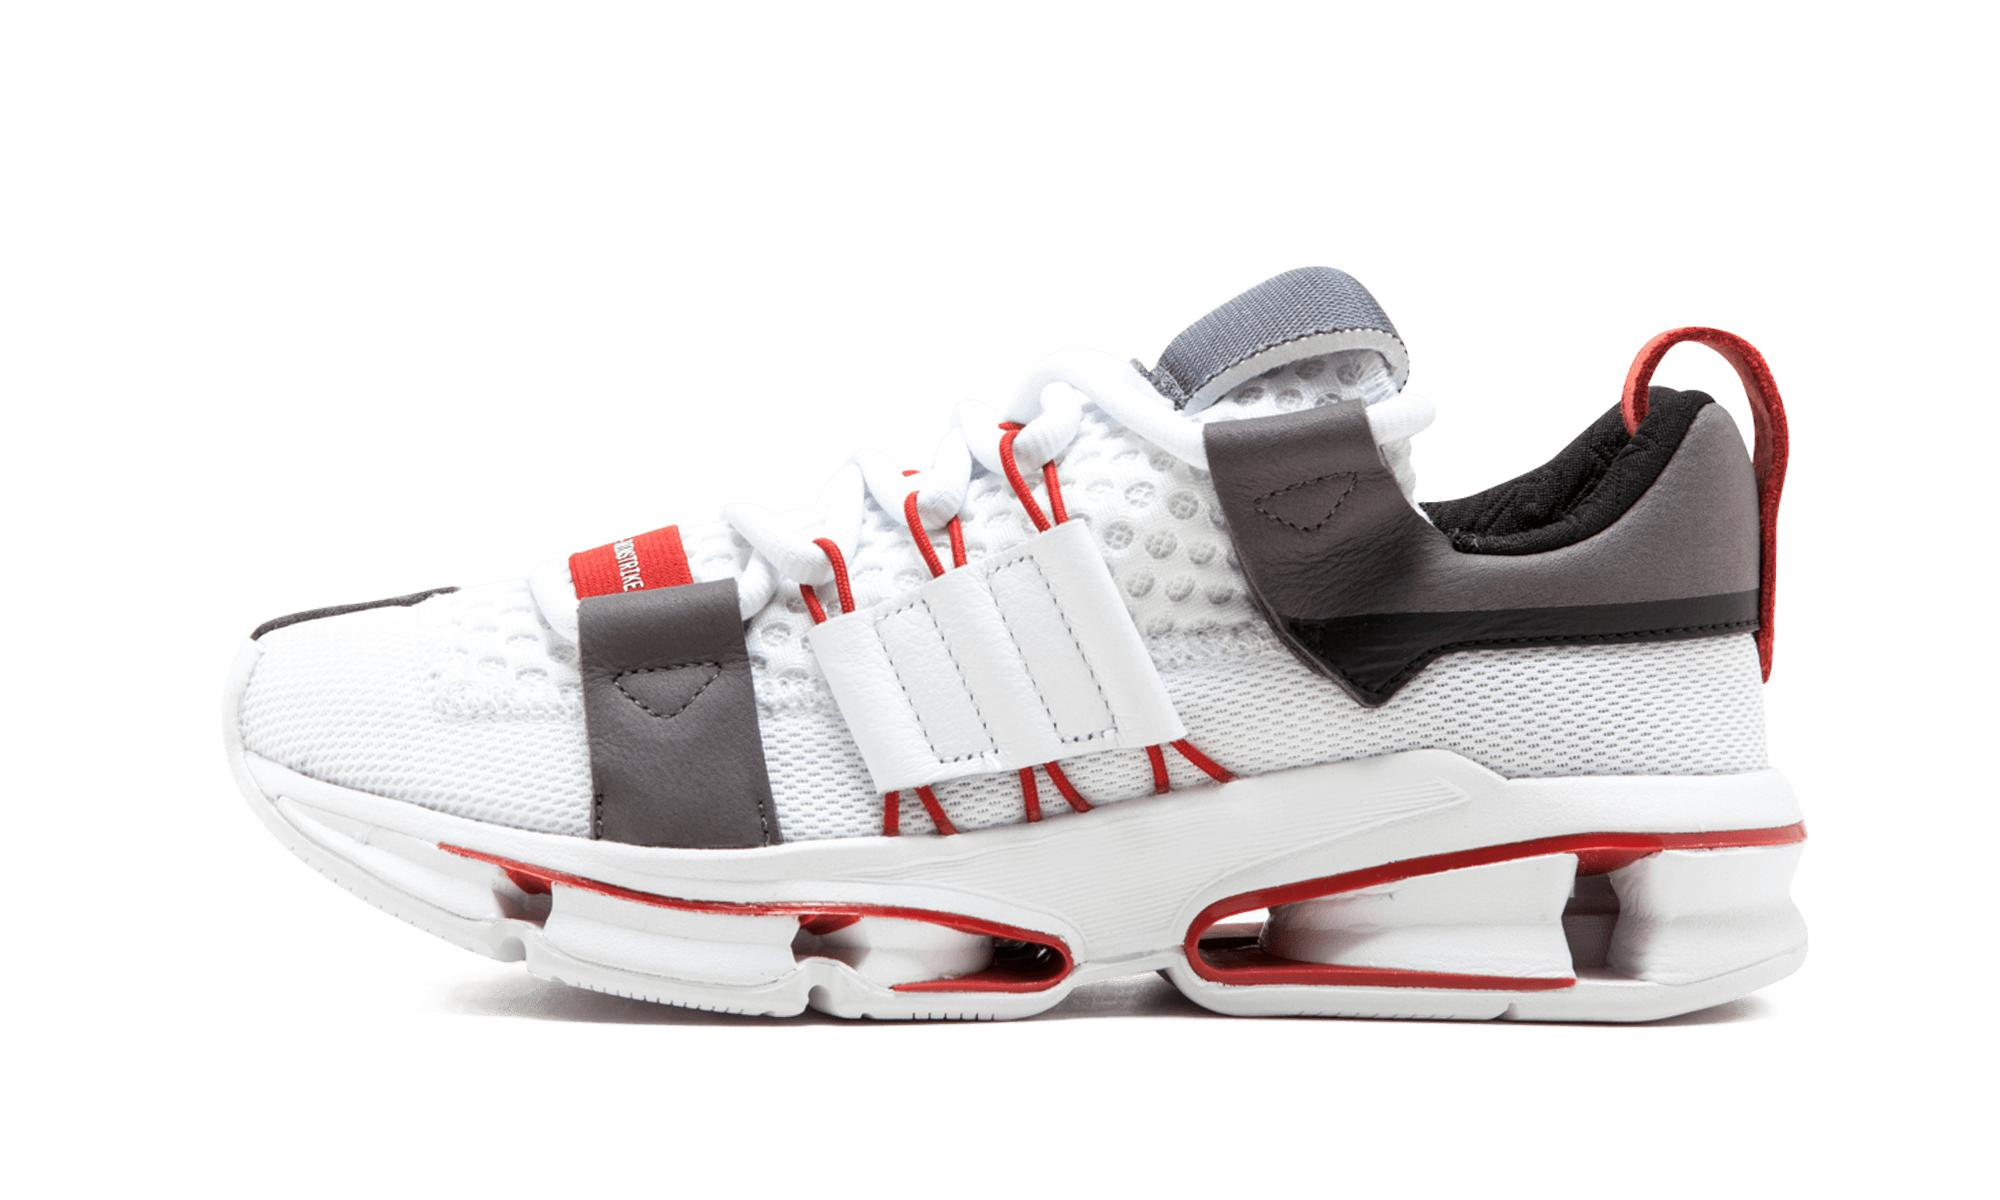 iniki runner adidas by9729 marine / blanc flight club